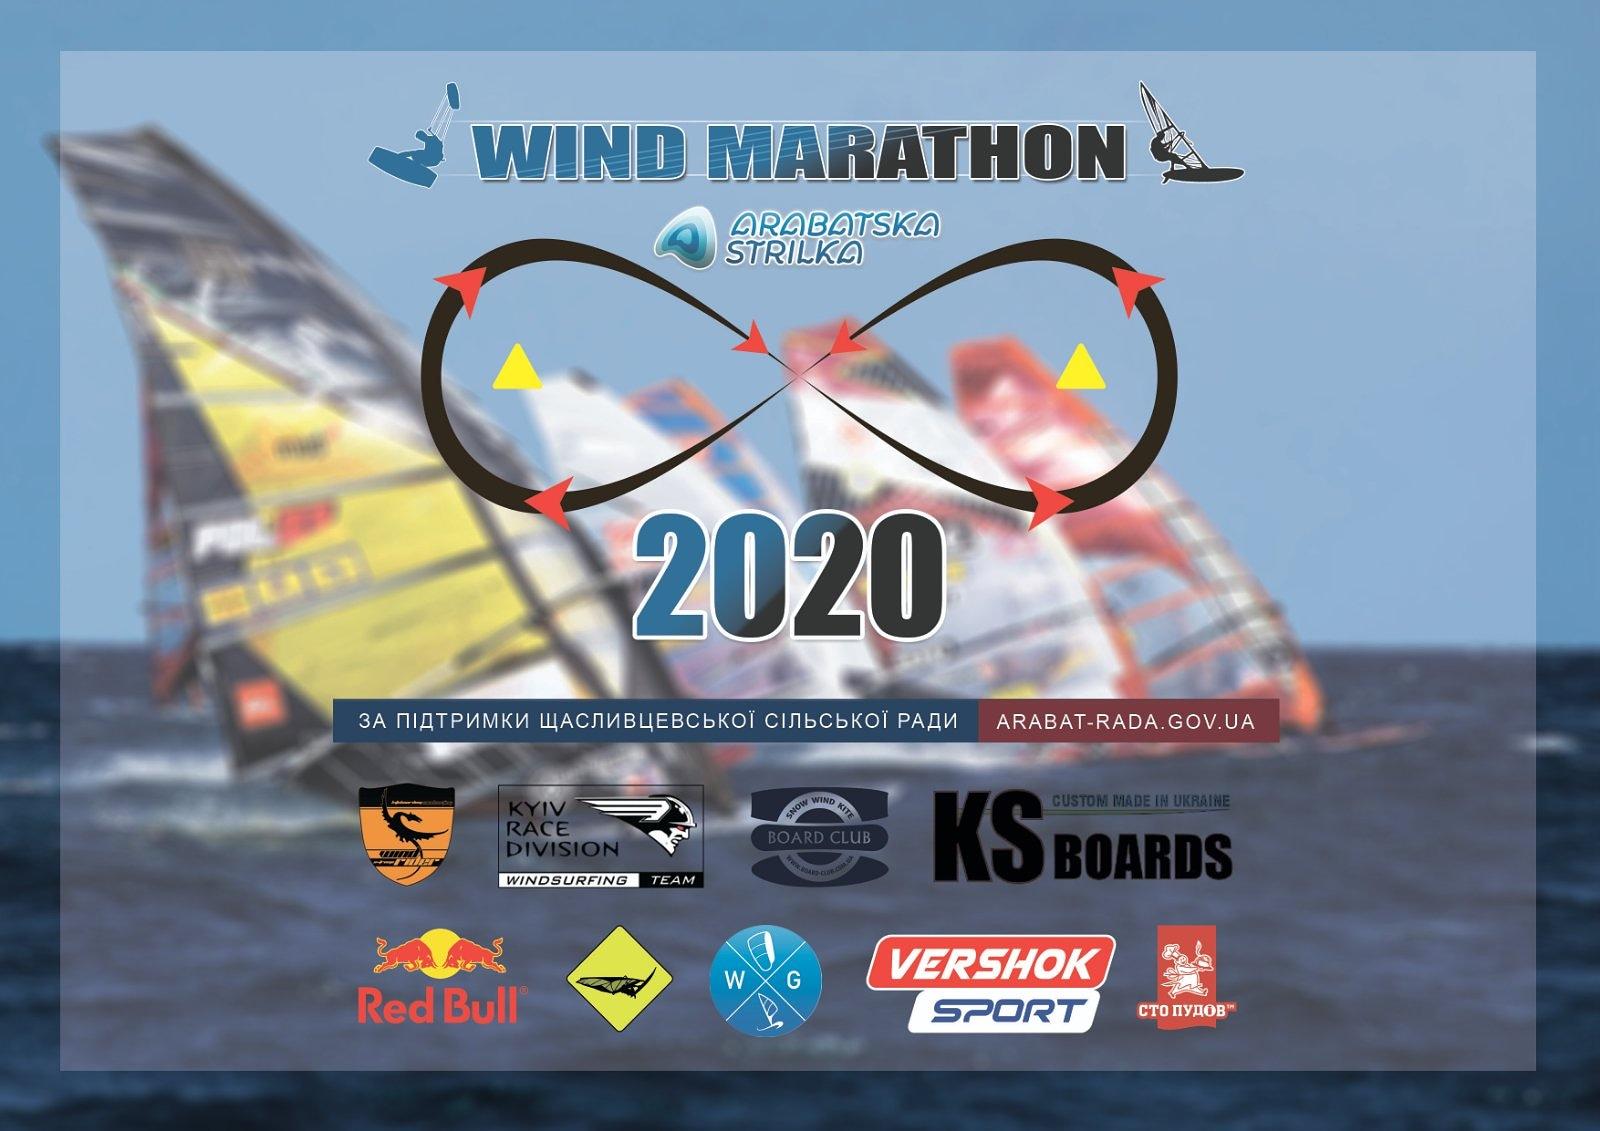 Wind marathon Arabatskaya strelka 2020. August